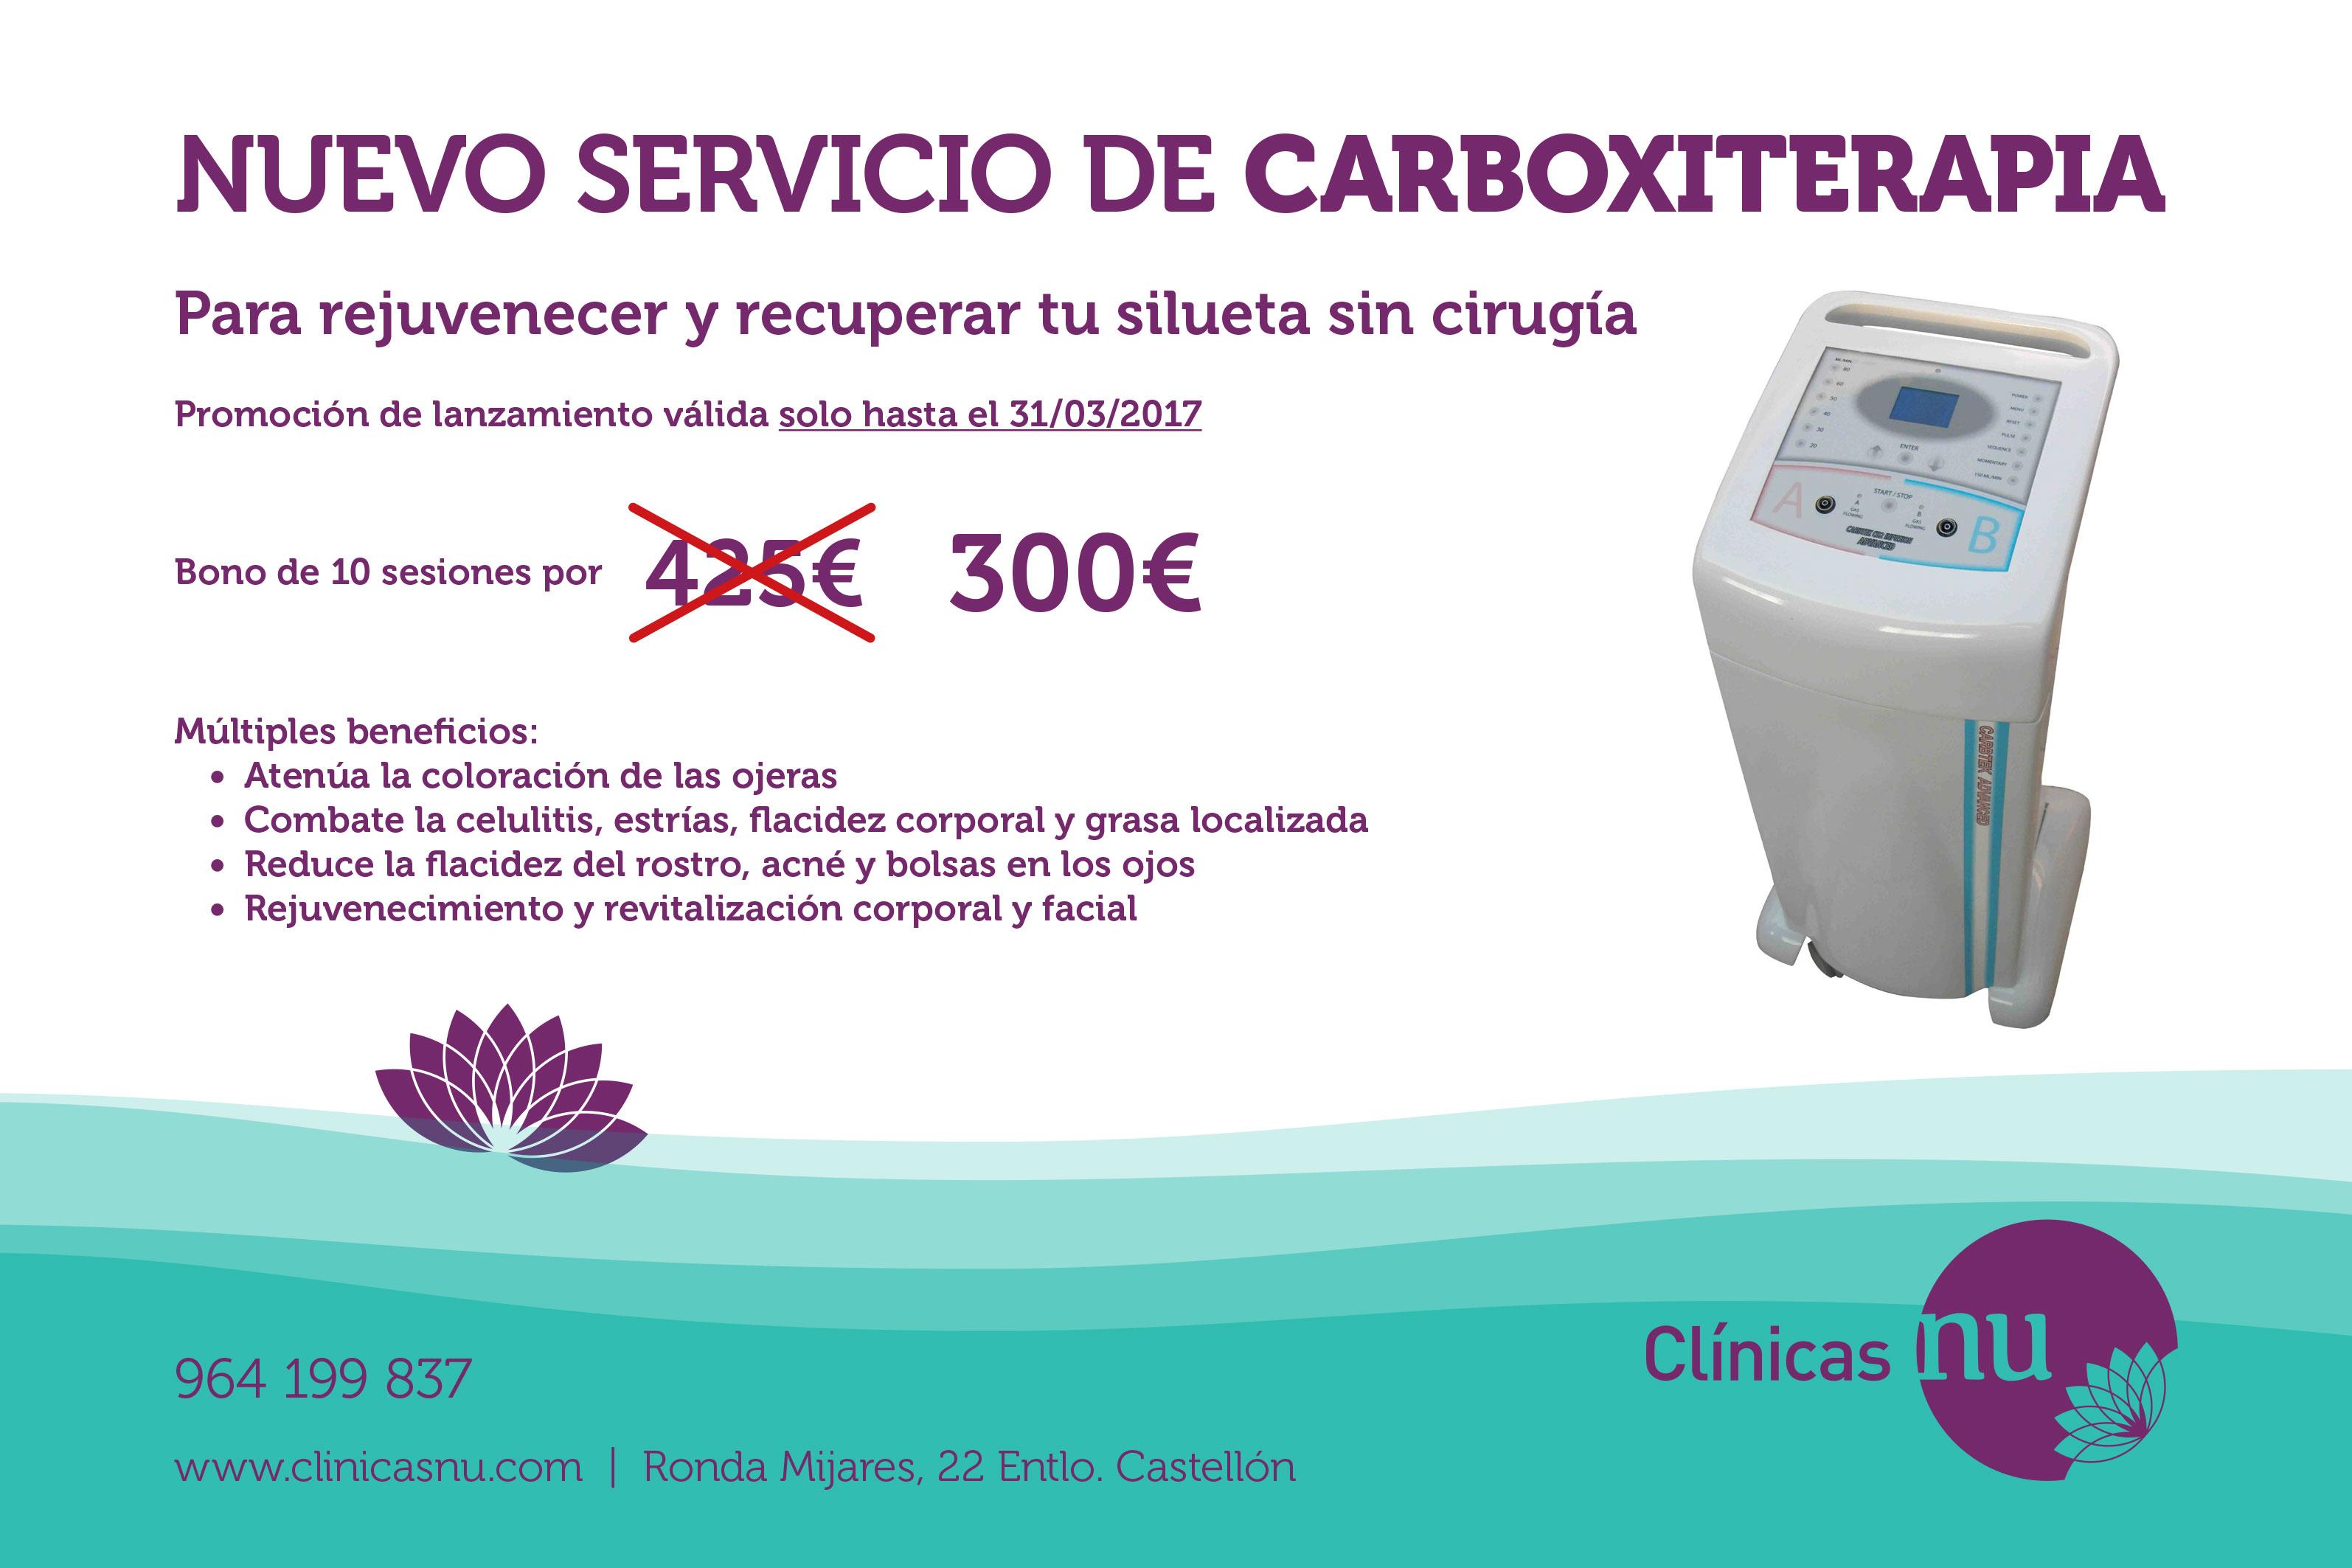 servicio-carboxiterapia-ja_ojeras